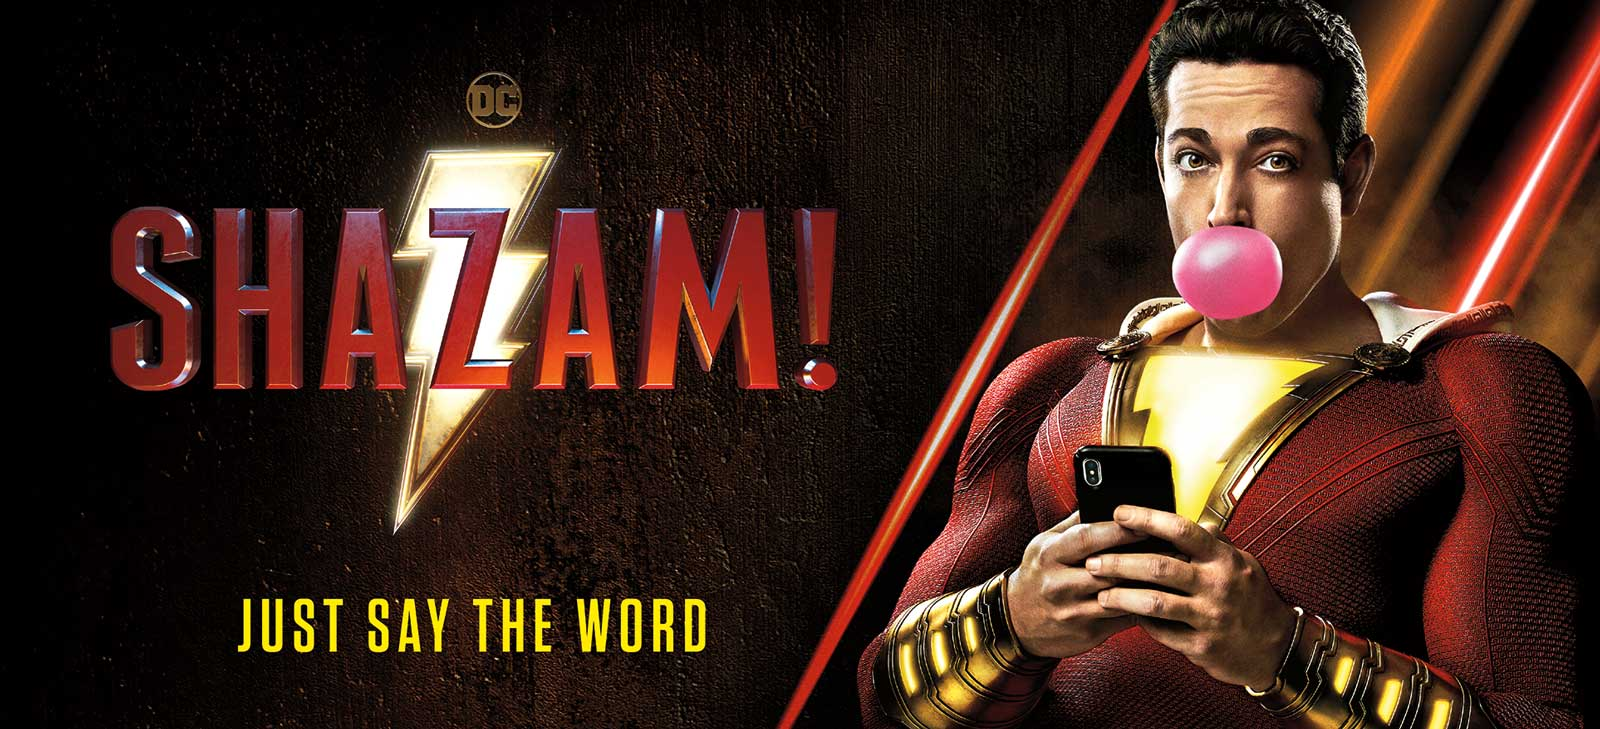 Shazam! Movie Poster 2019 SNIP